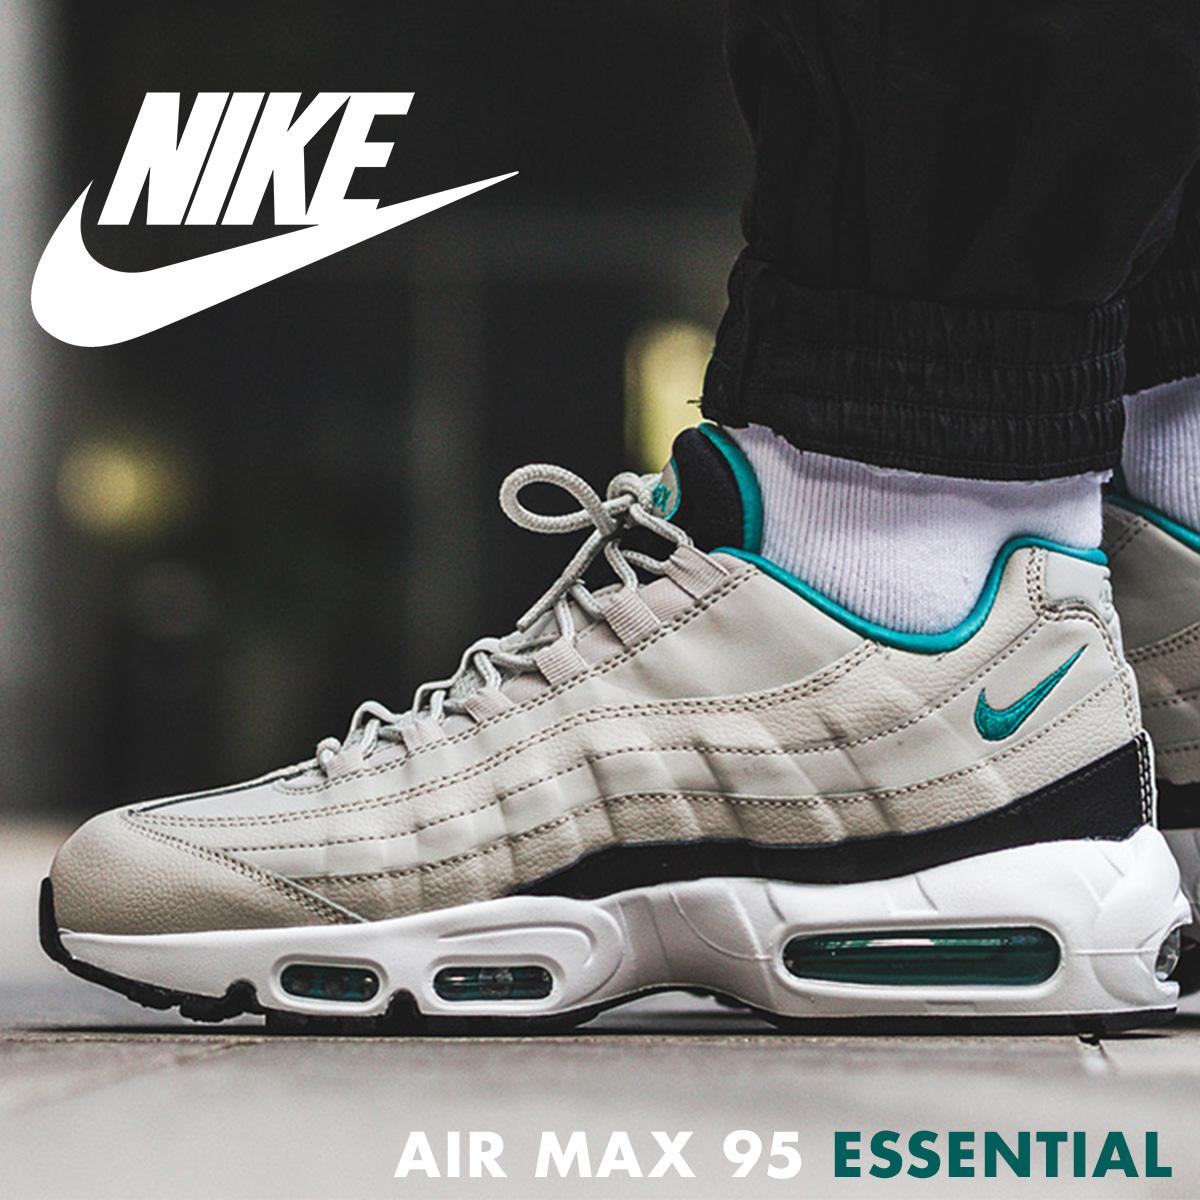 Nike NIKE Air Max 95 essential sneakers men AIR MAX 95 ESSENTIAL 749,766 027 off white white [196]